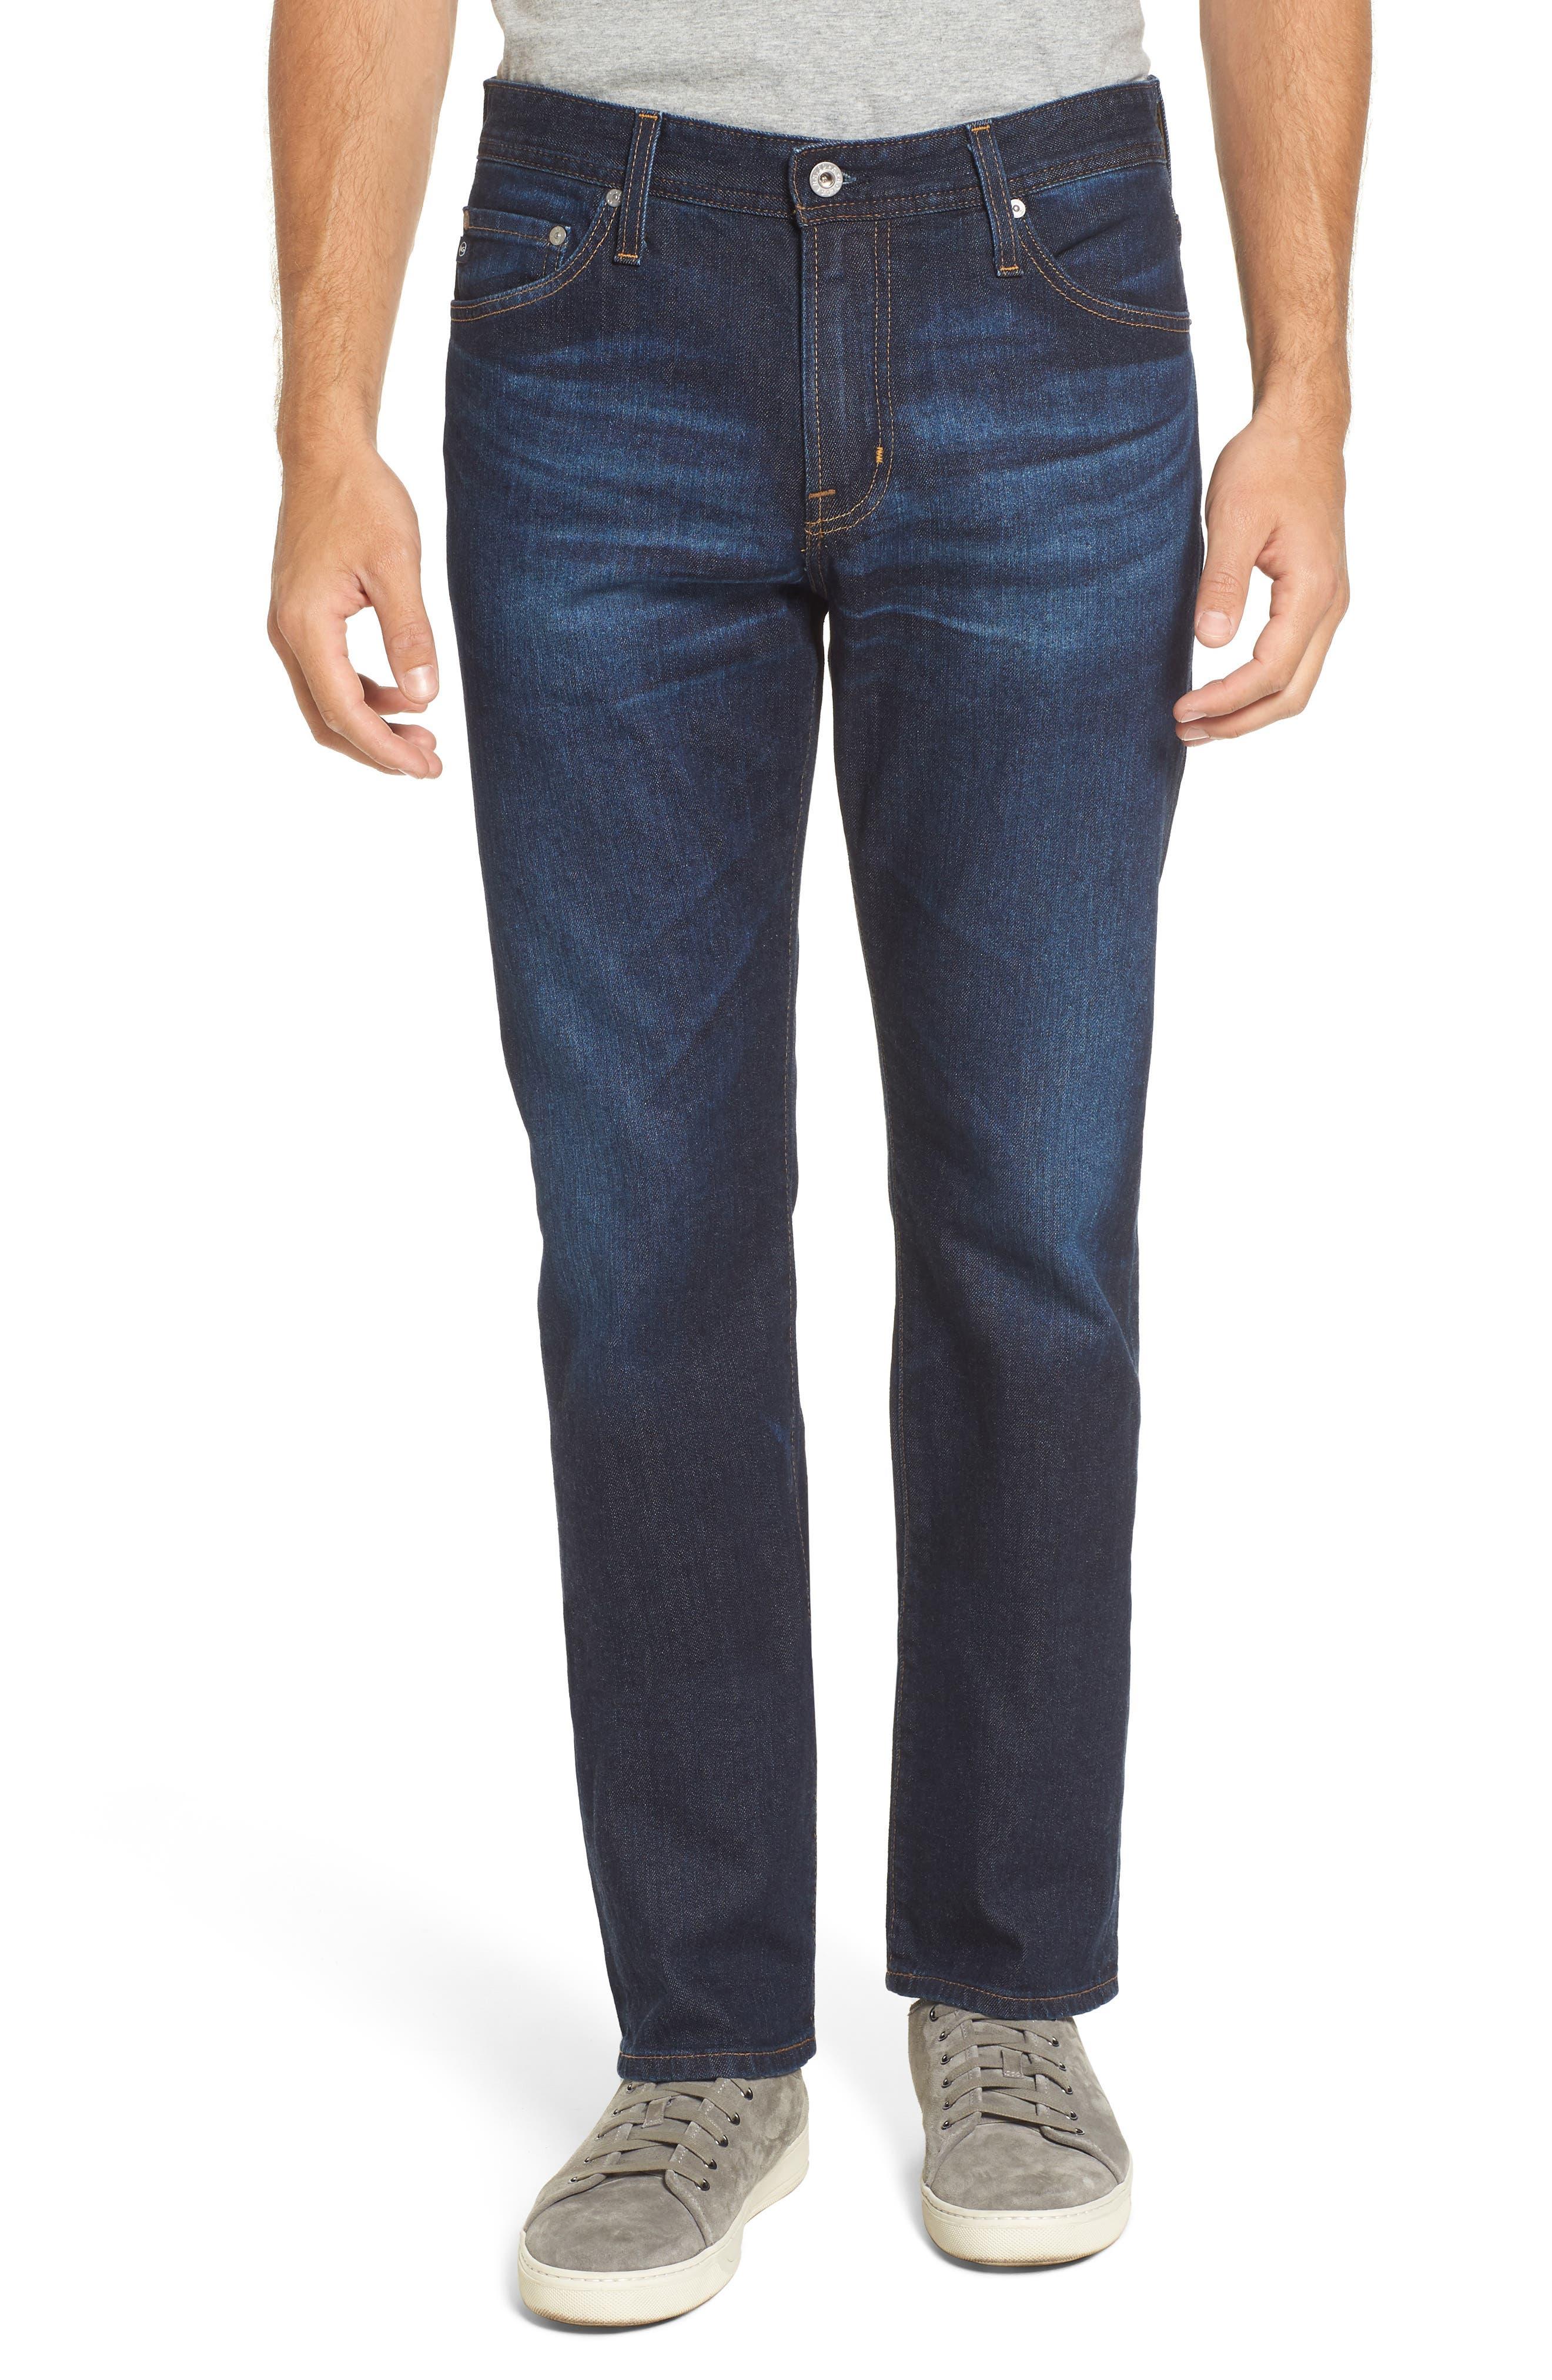 Everett Slim Straight Leg Jeans,                             Main thumbnail 1, color,                             409